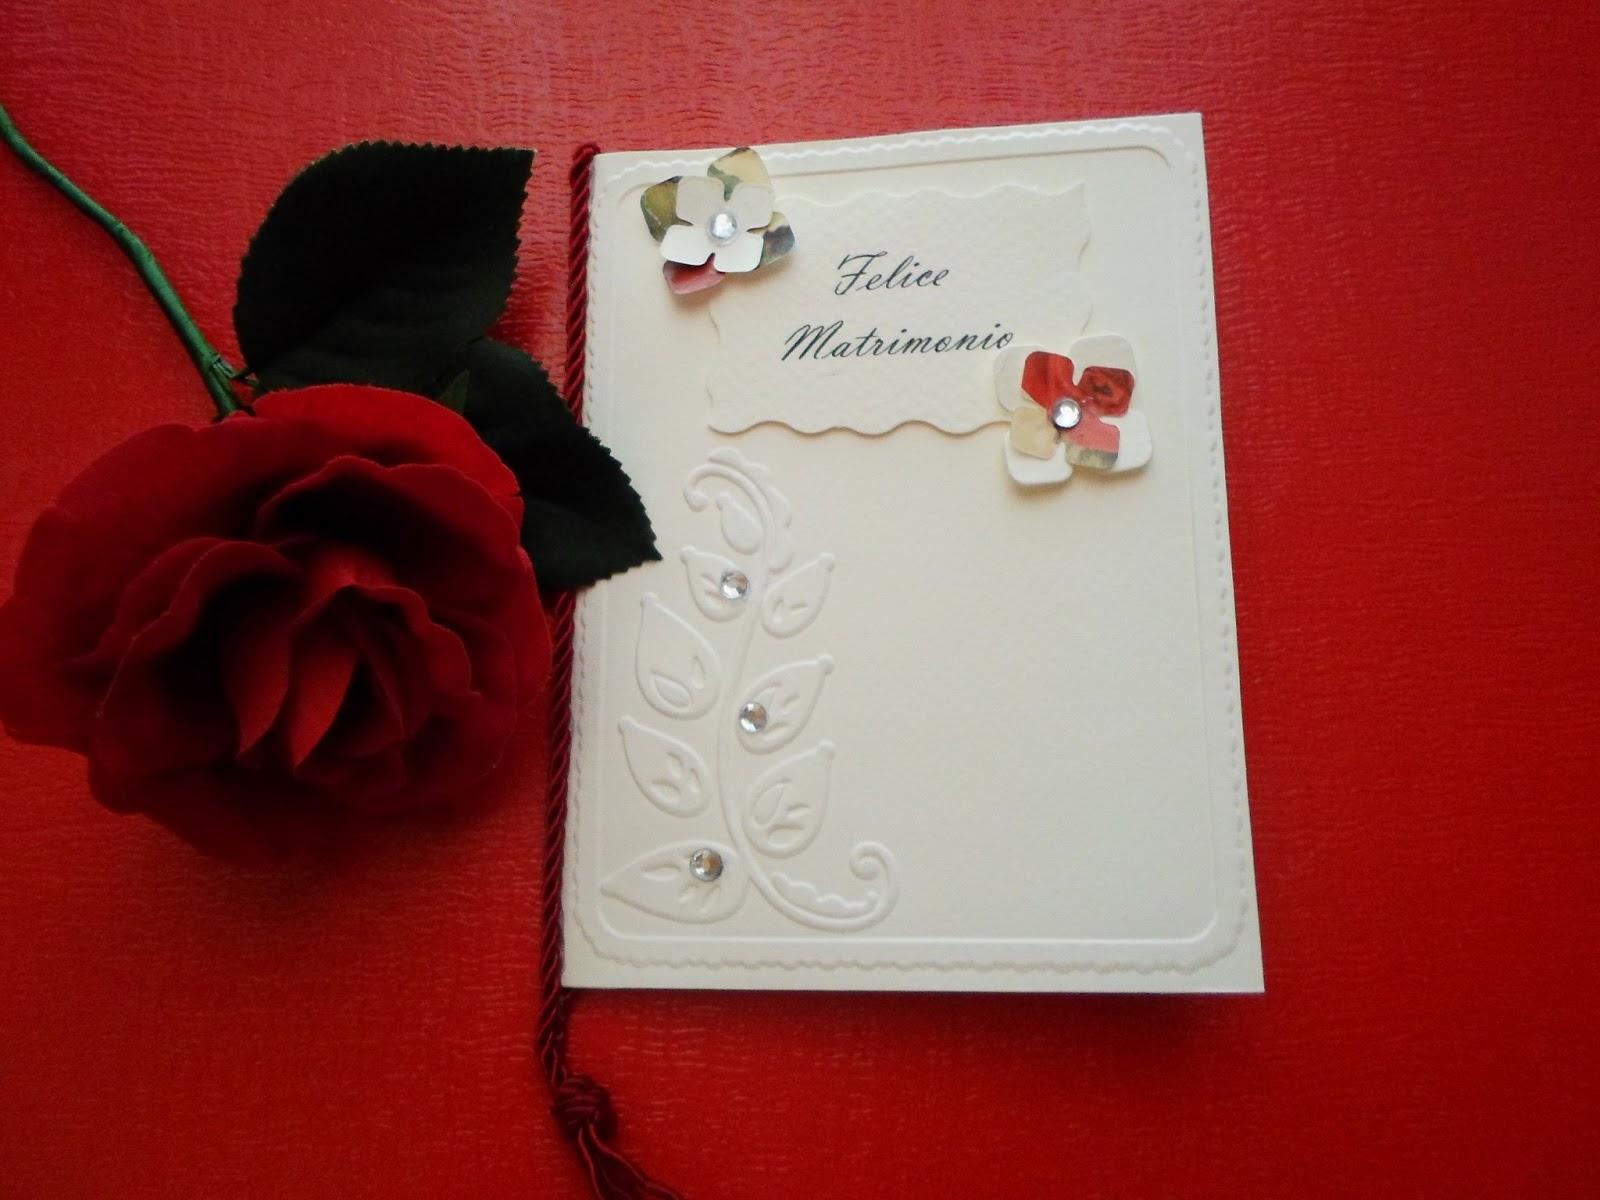 Auguri Matrimonio Zii : Preziose raffinatezze biglietto auguri matrimonio fai da te